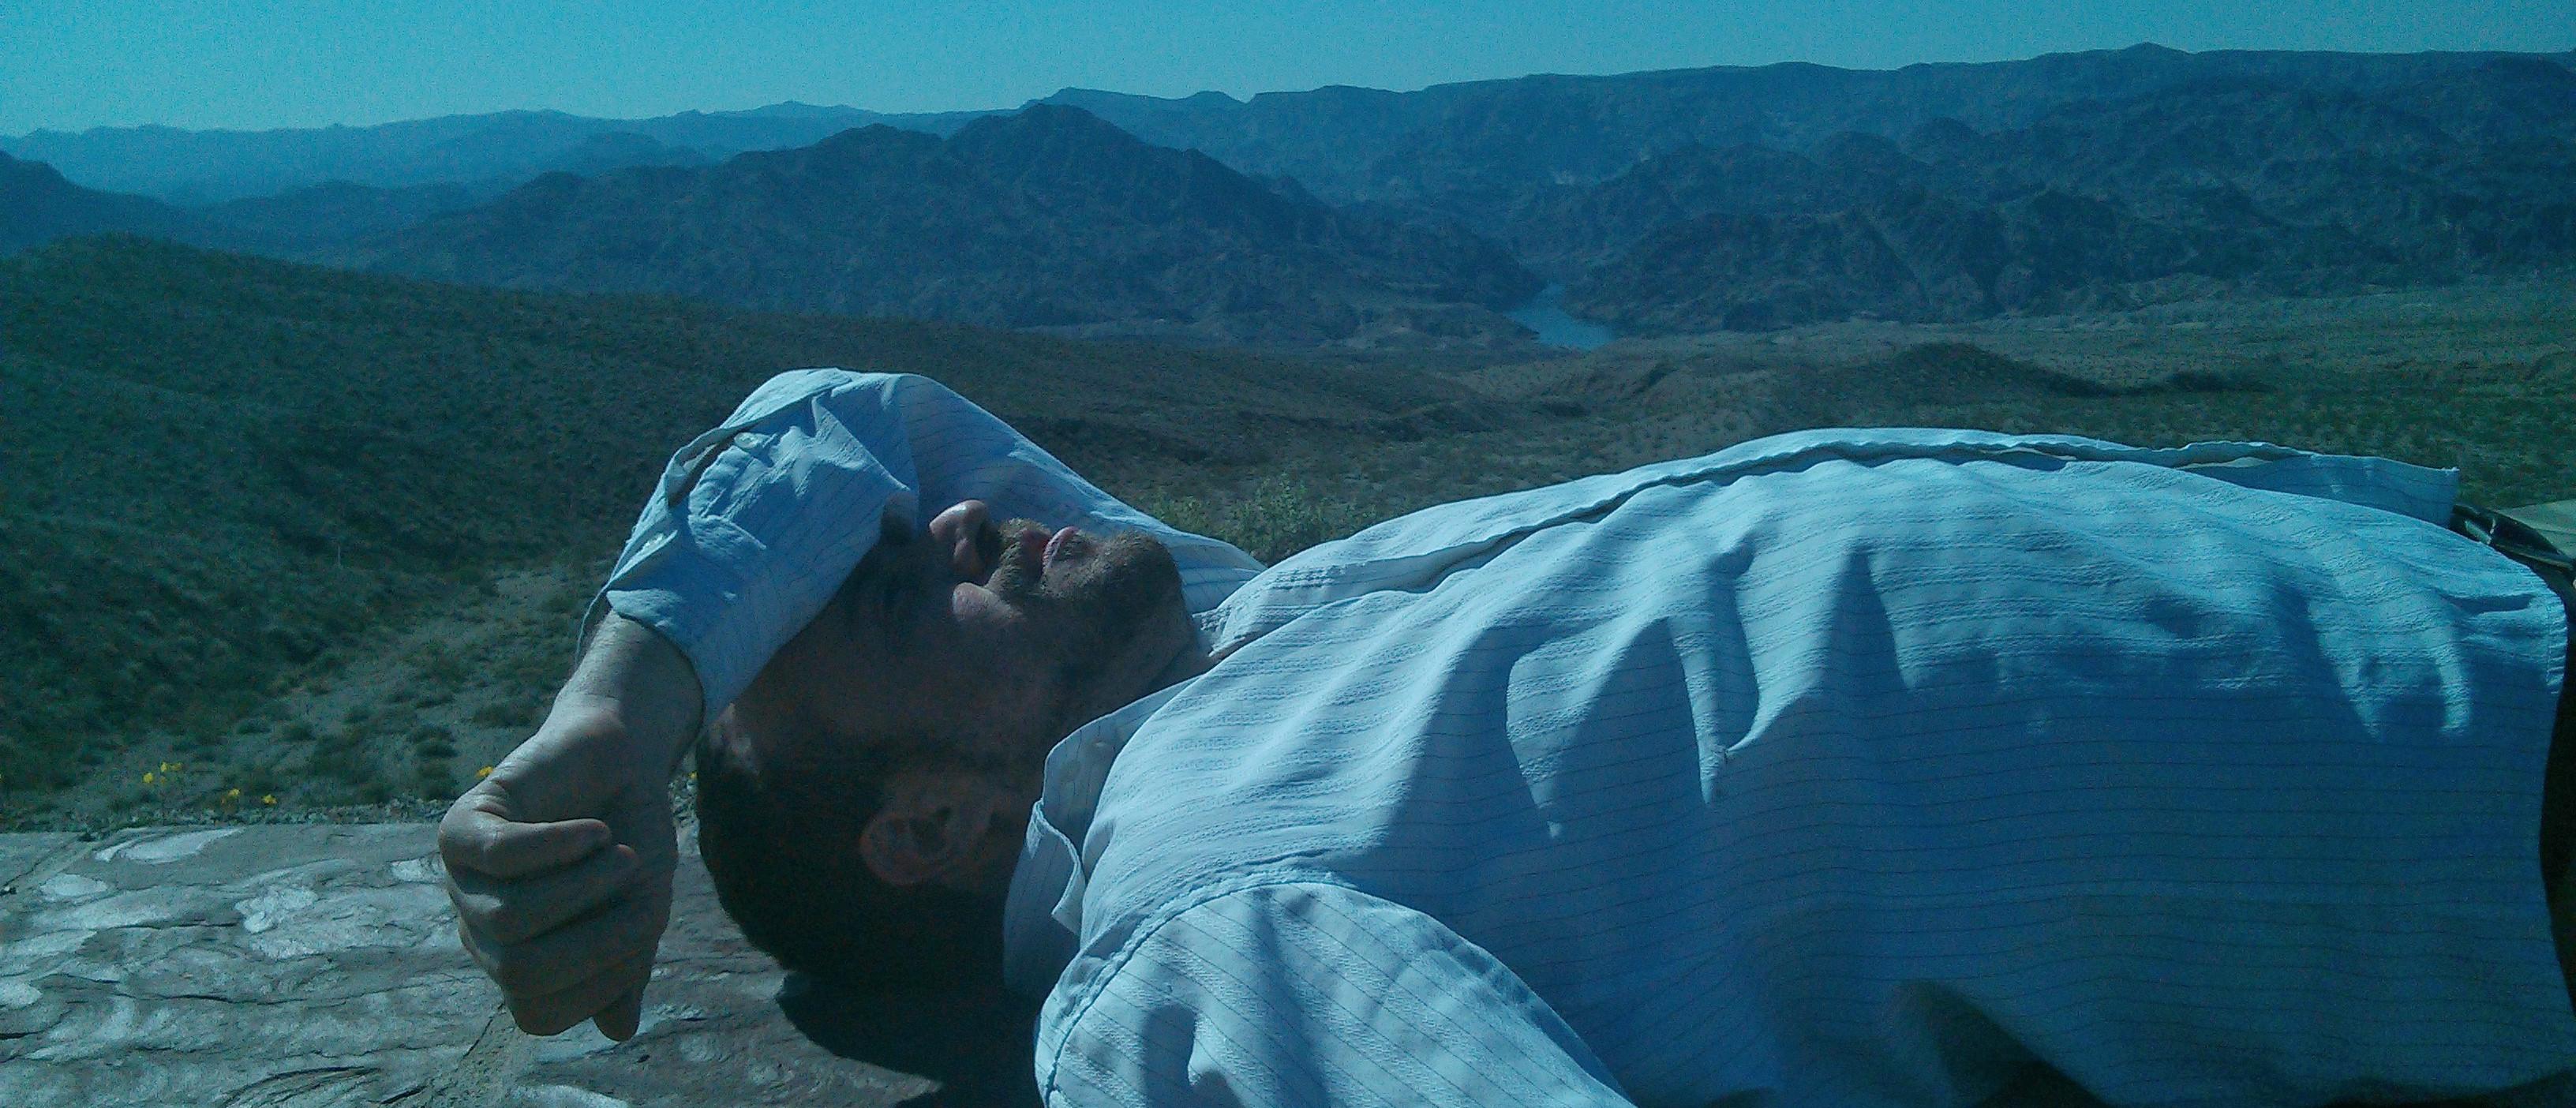 Resting after Las Vegas in the Arizona desert